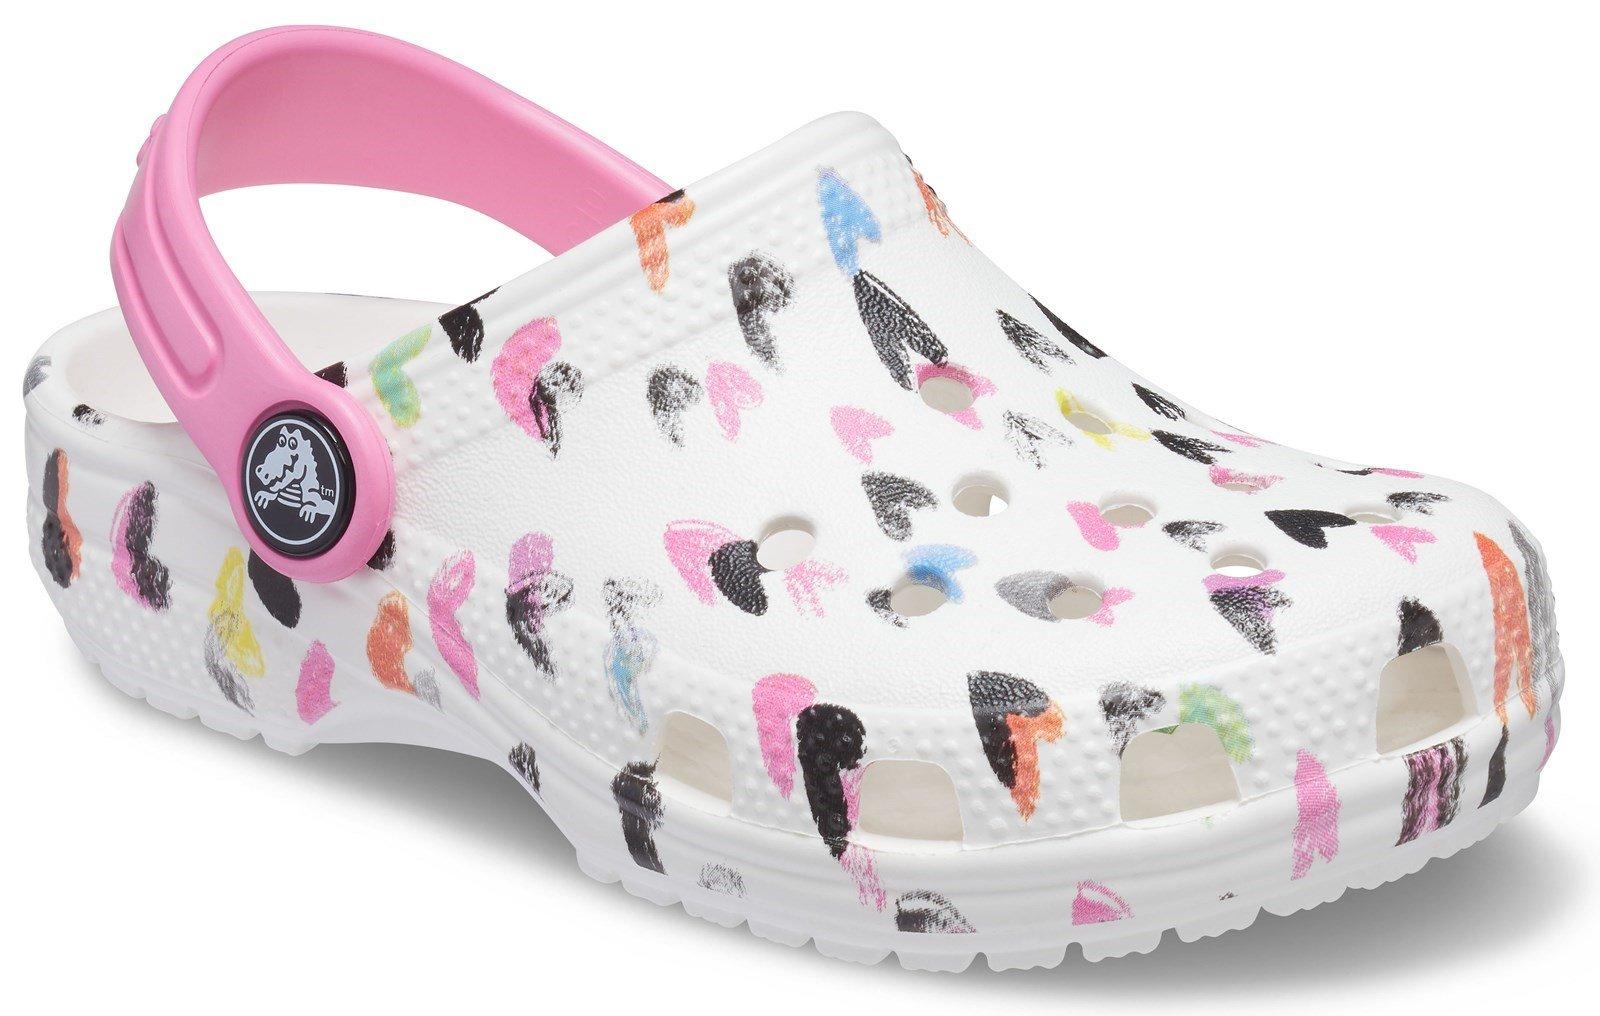 Crocs Kid's Classic Heart Print Clog Sandal White 32079 - White 4